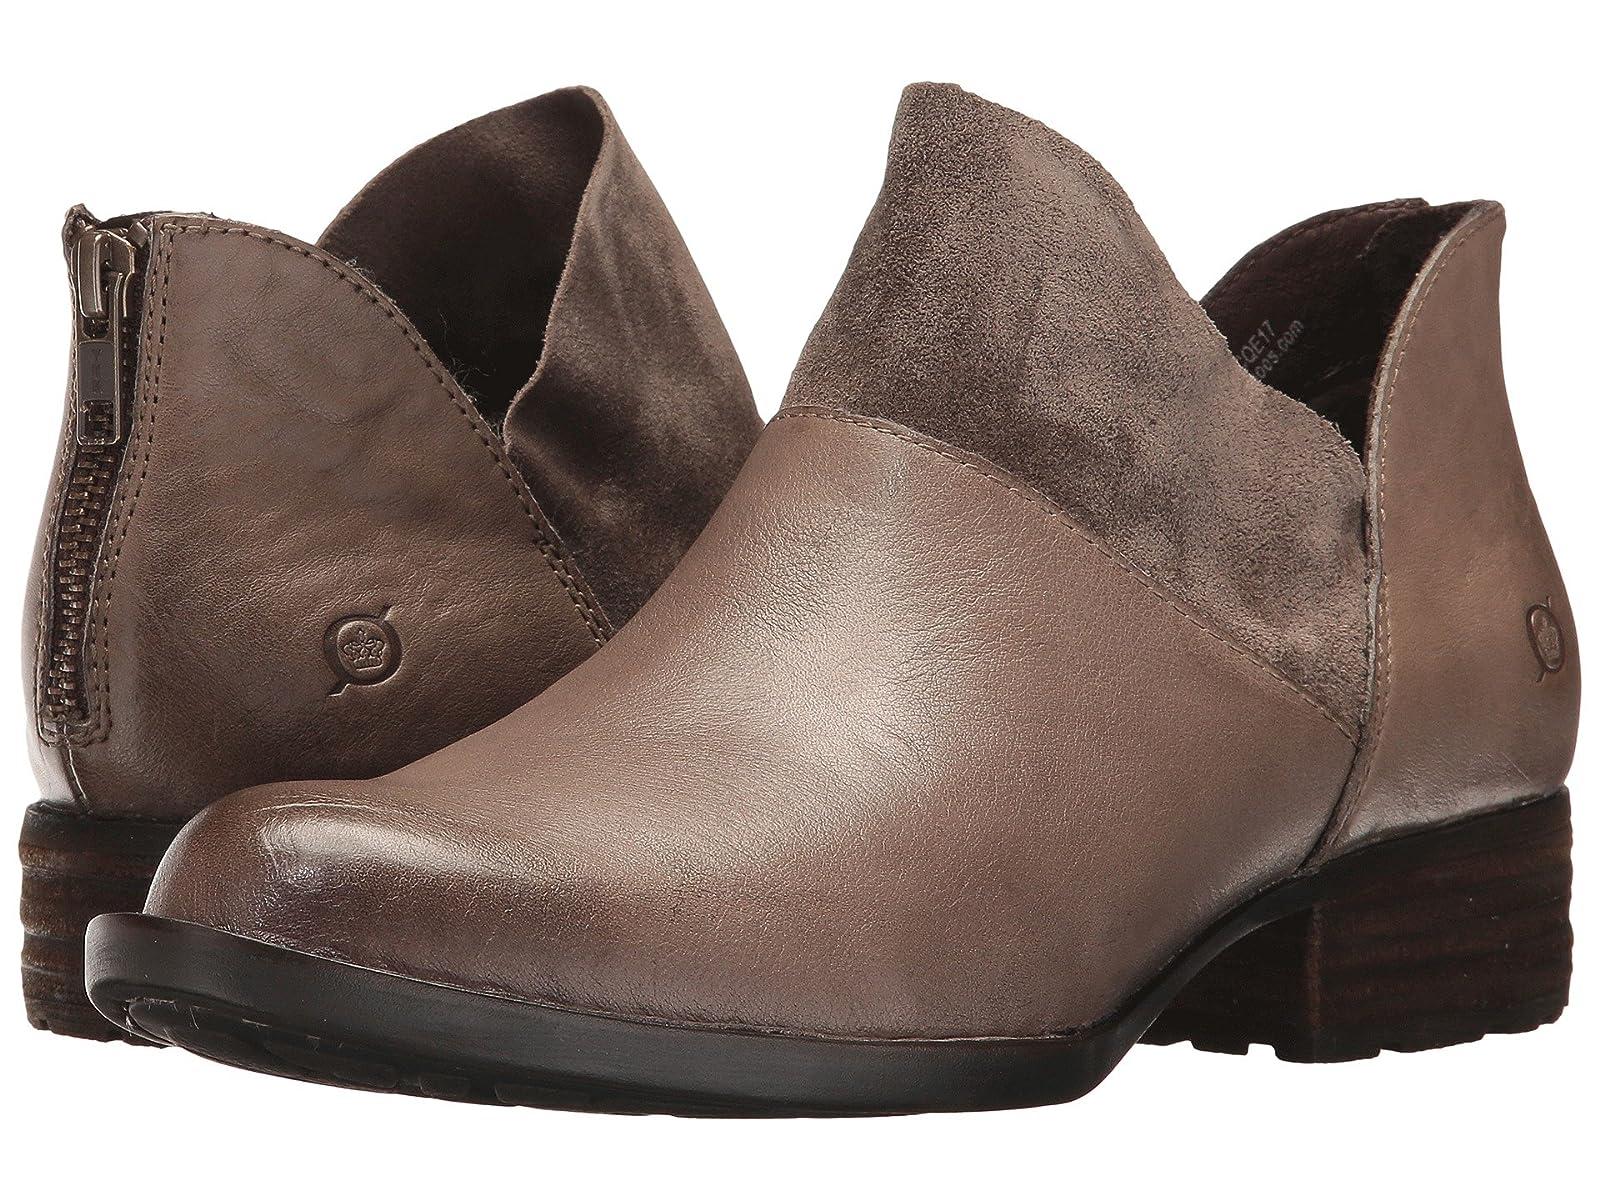 Born KaravaCheap and distinctive eye-catching shoes